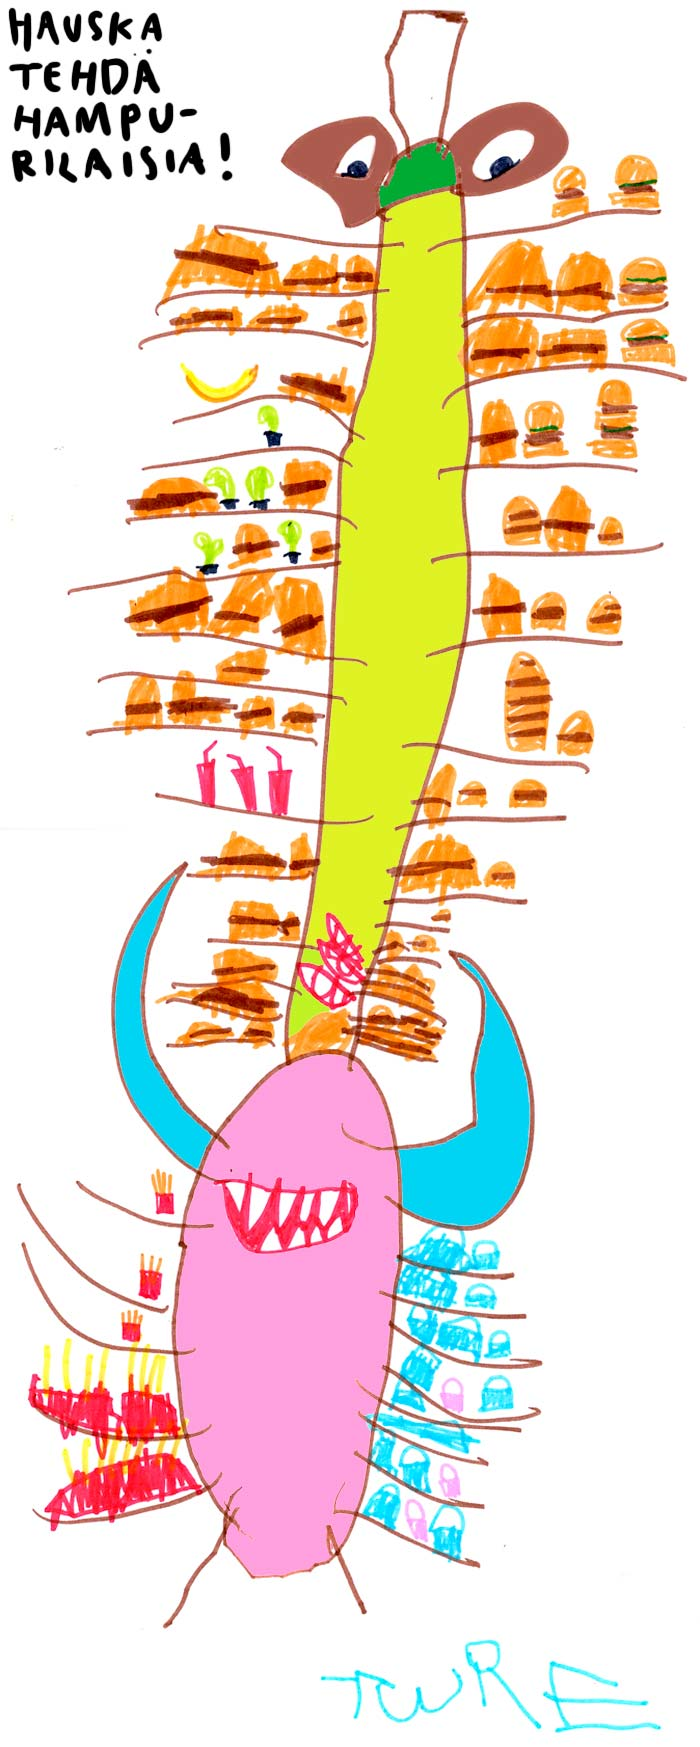 hampurilaishirvio